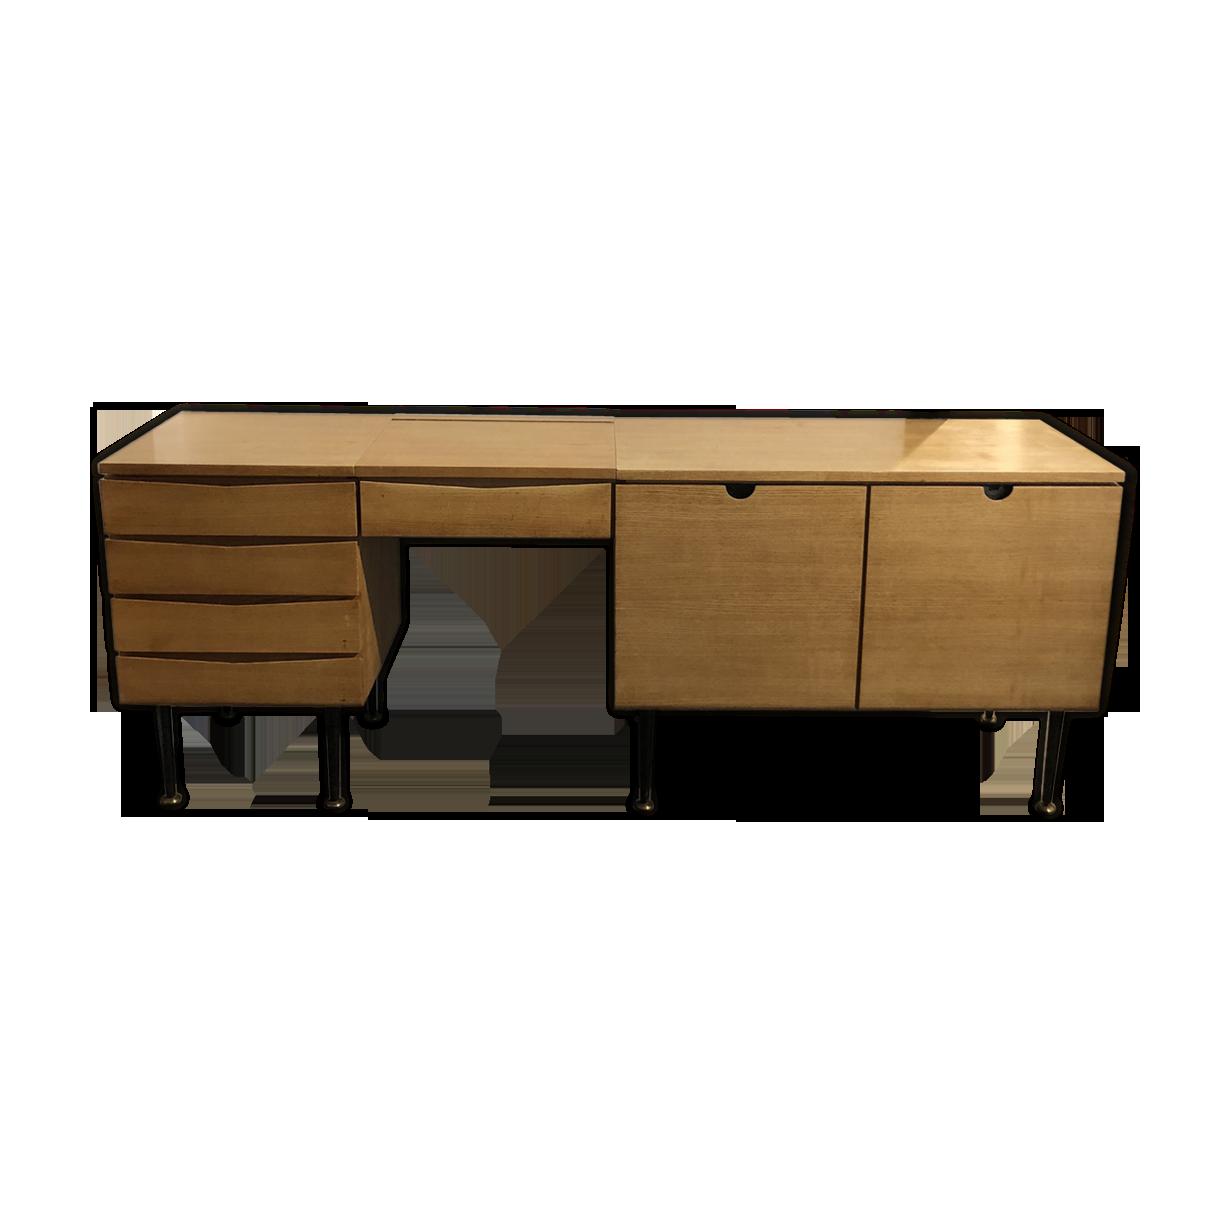 Meuble enfilade bureau coiffeuse bois matériau bois